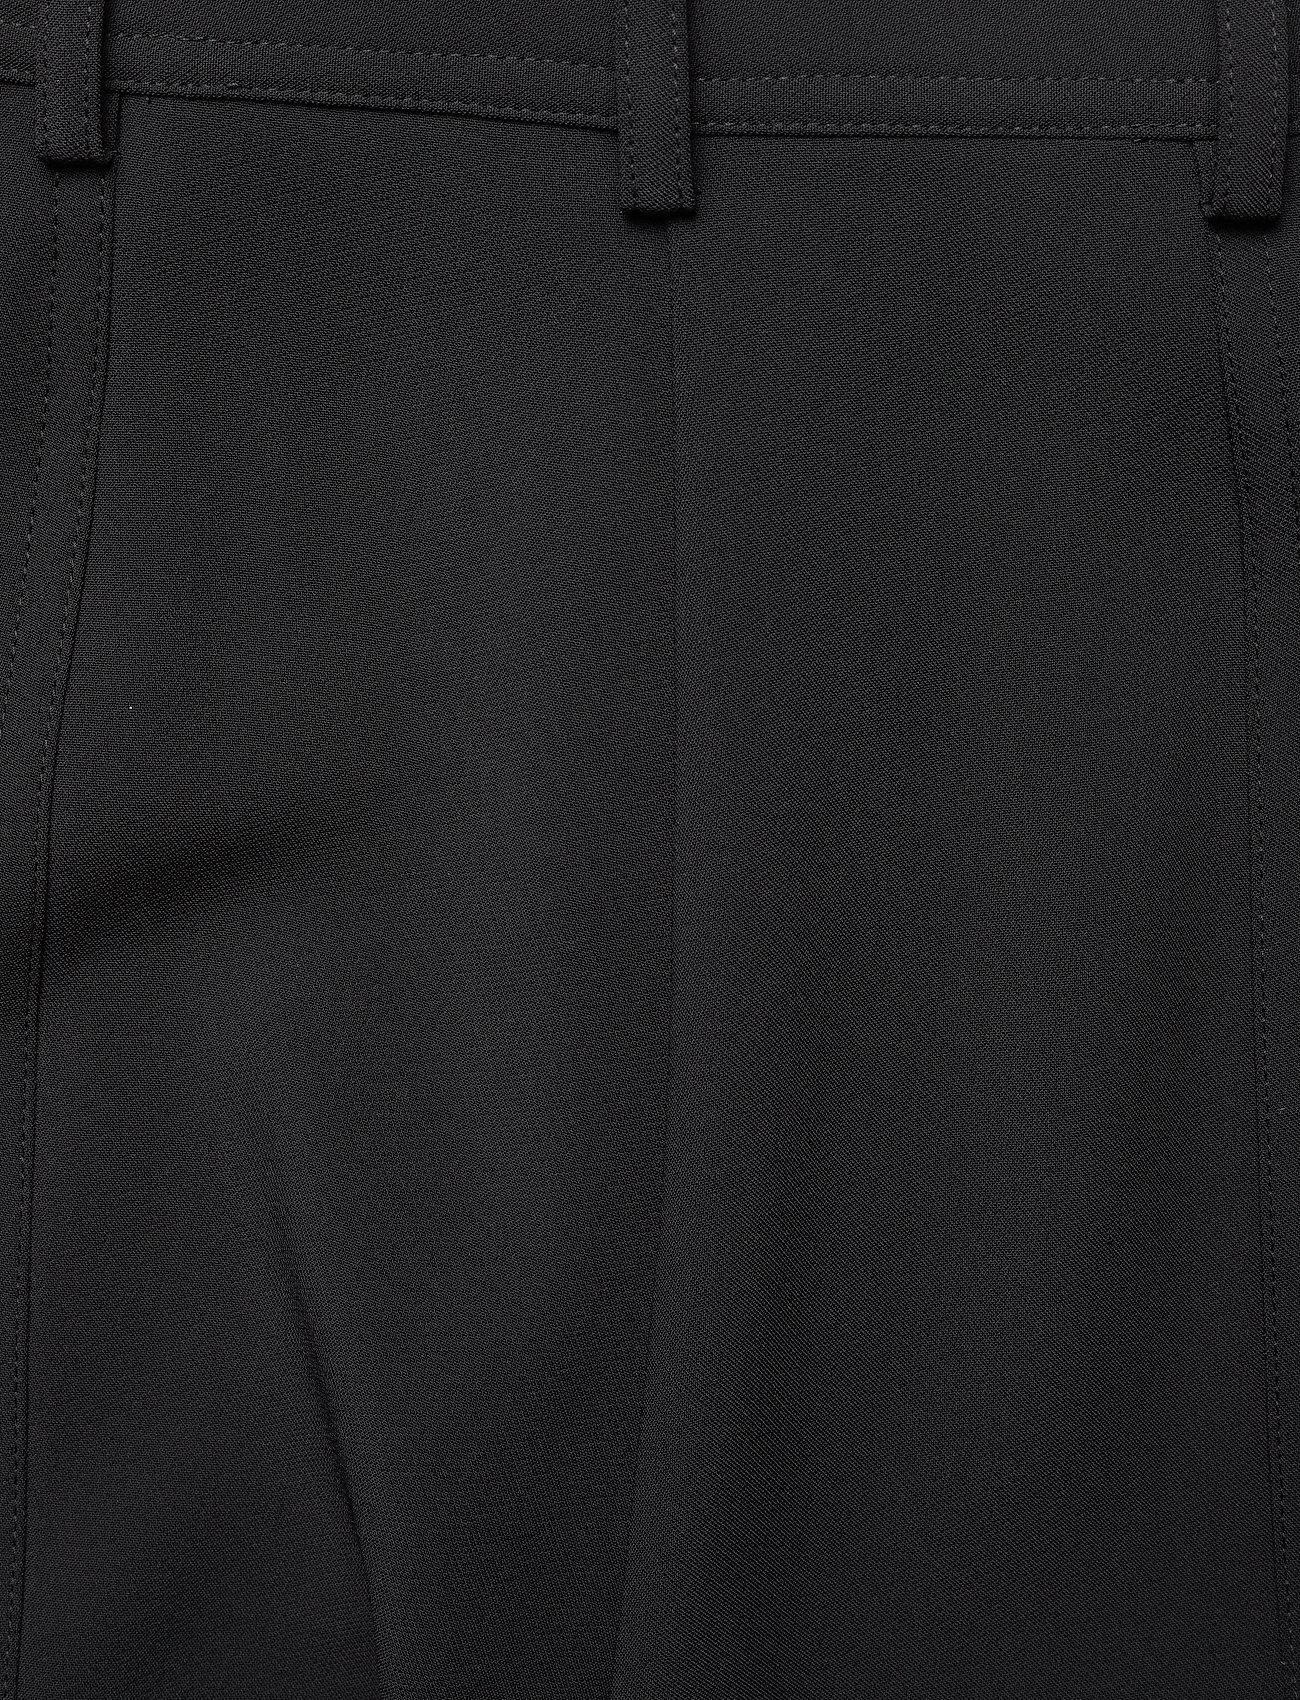 Travel Crepe Cargo Stl Pant (Calvin Black) (1000 kr) - Calvin Klein